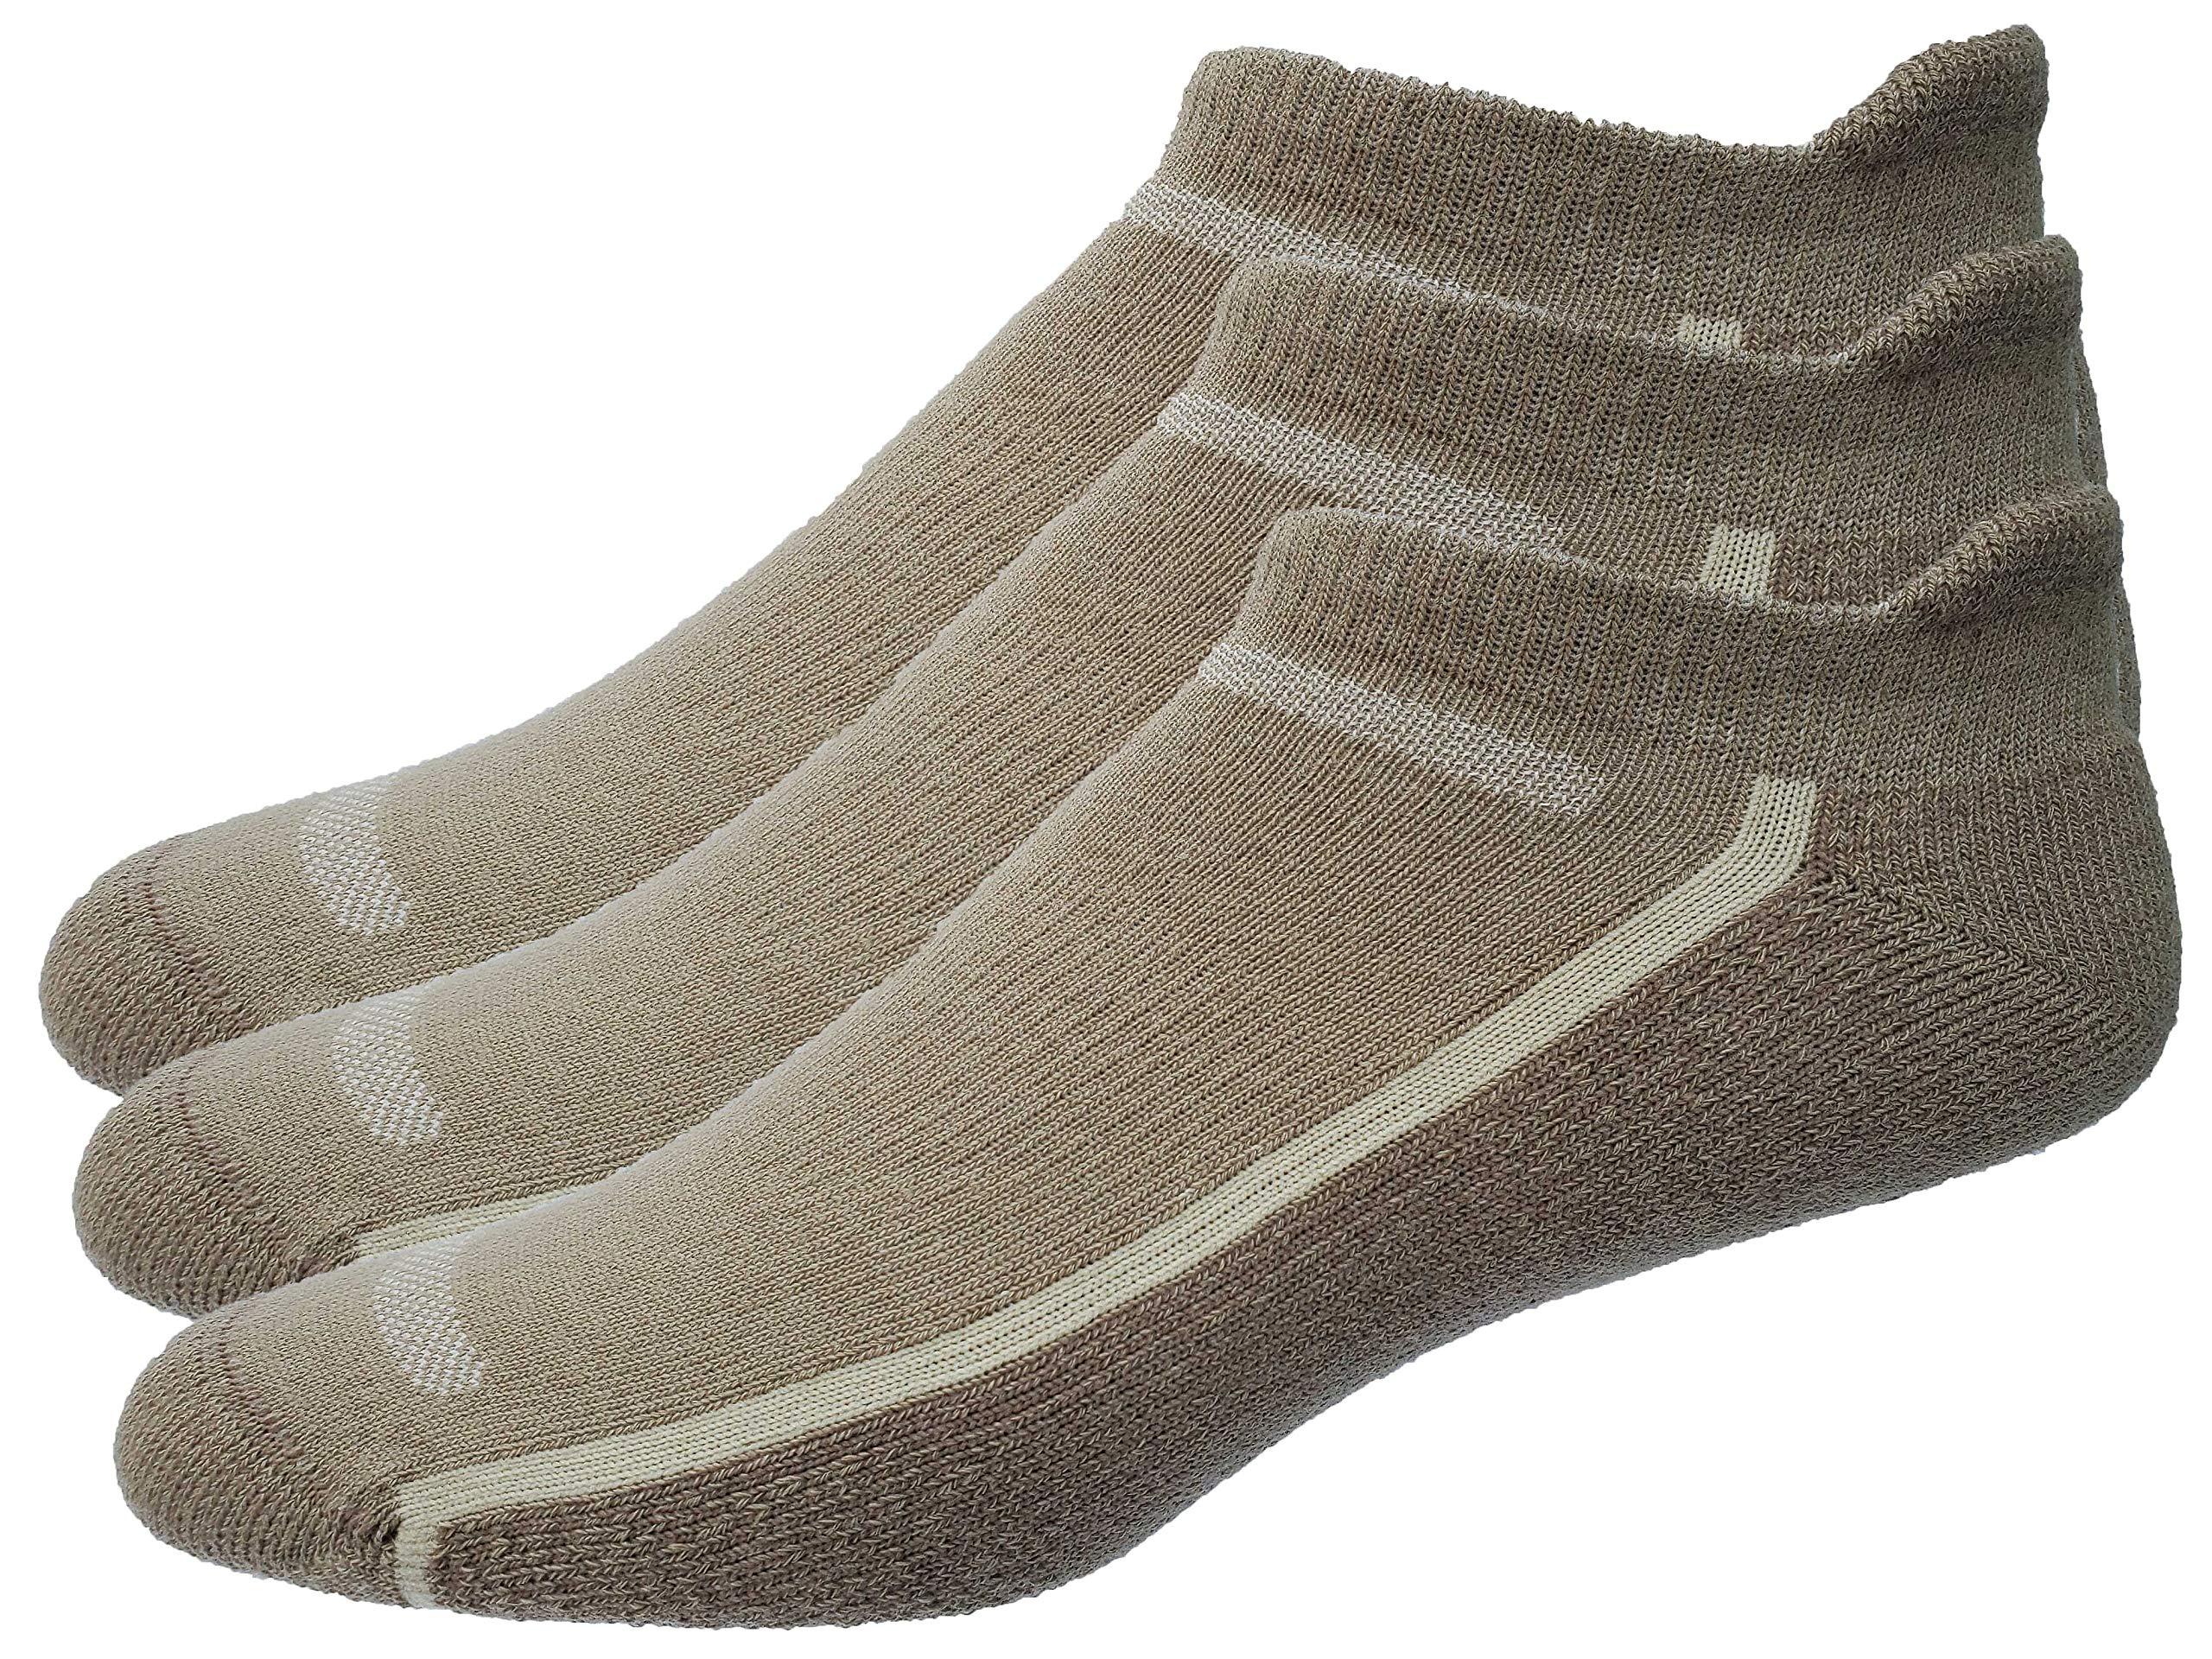 Mens 3-Pack No Show Tab Golf Socks (Large, Khaki) by High Falls Footwear